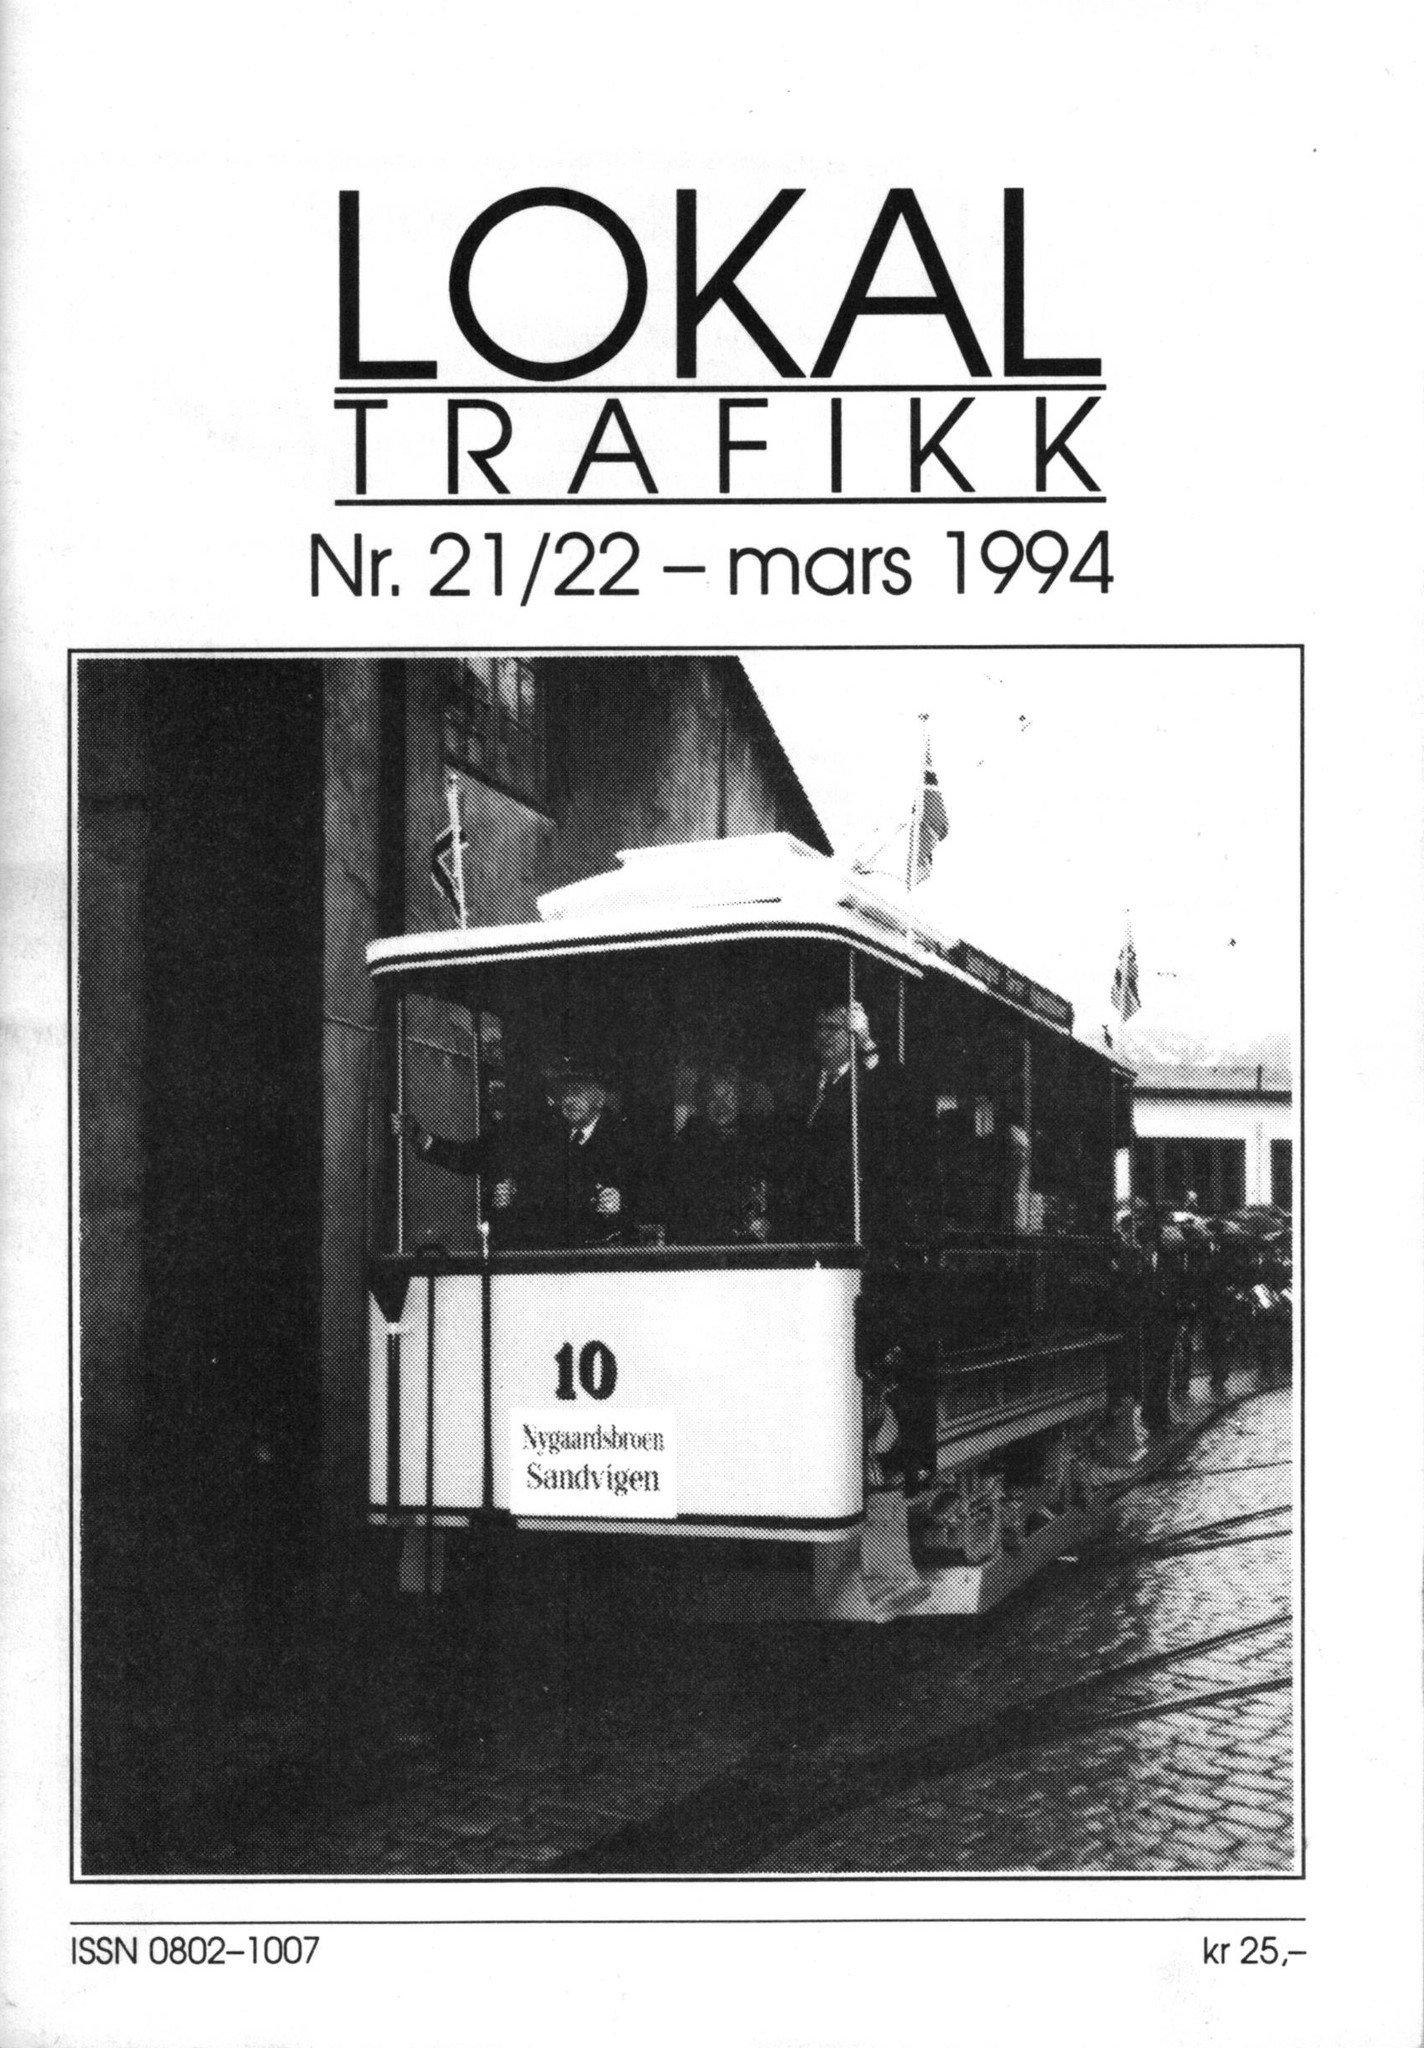 Lokaltrafikk #021/022